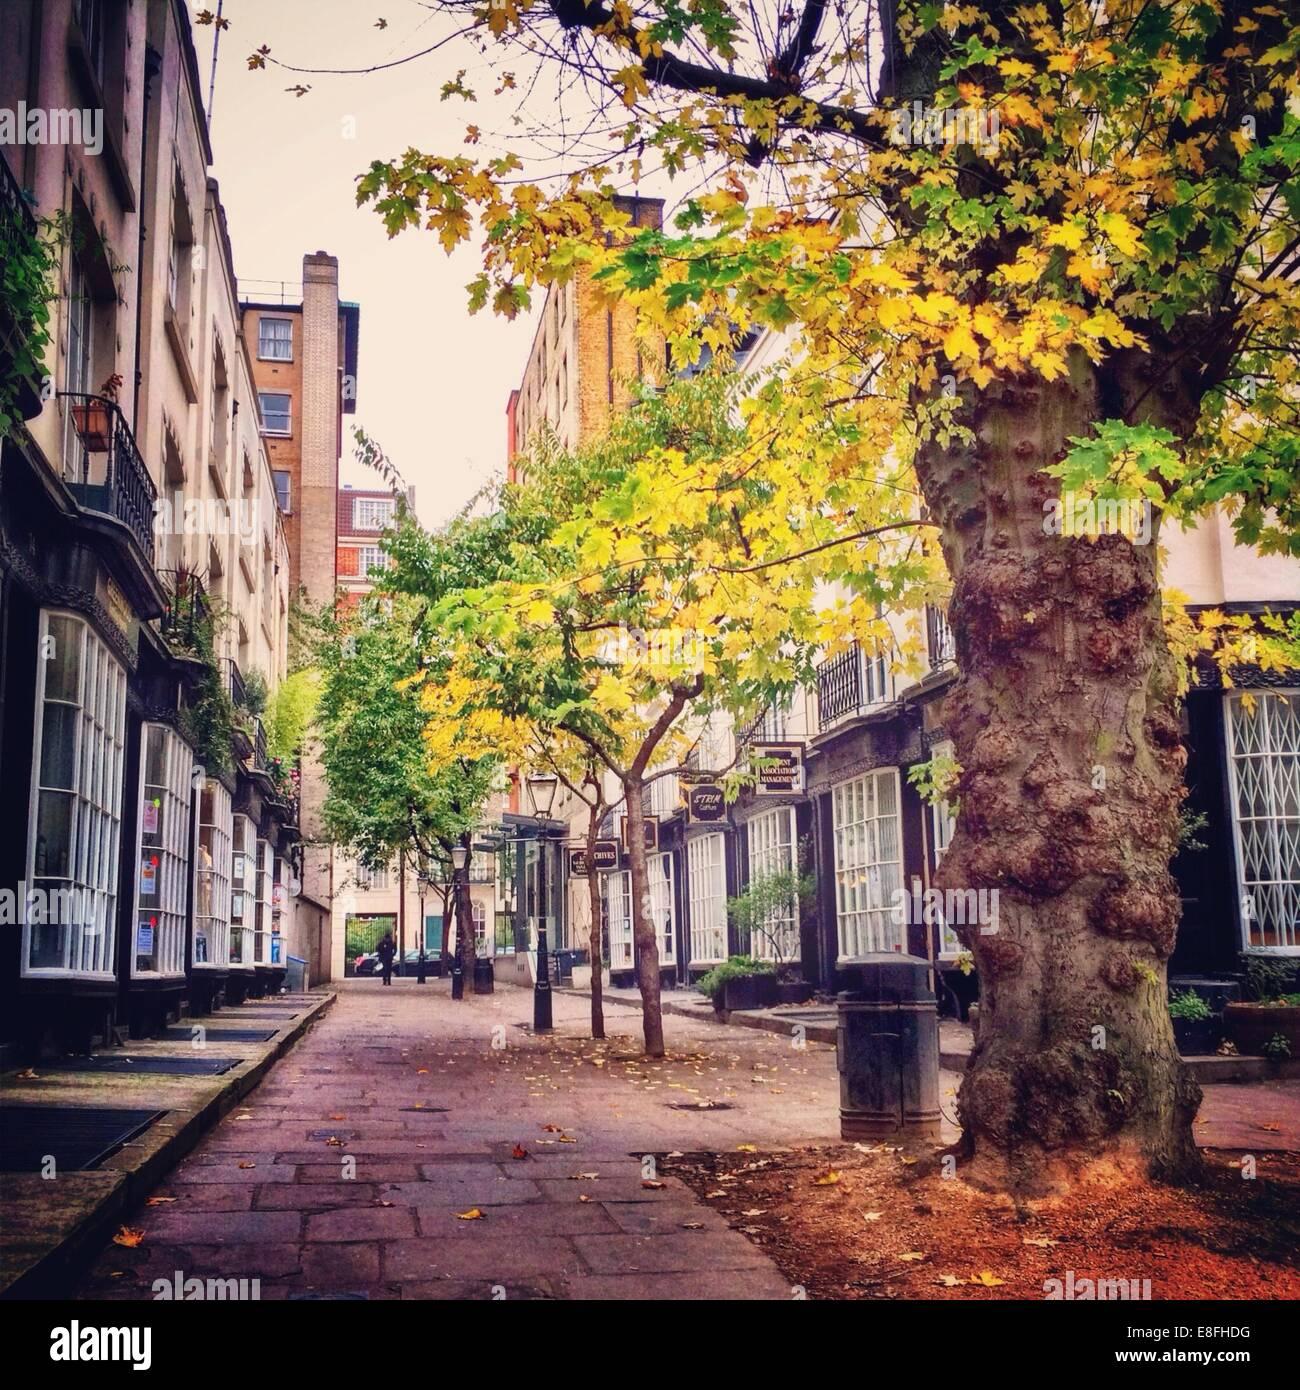 Regno Unito, London, Greater London, Bloomsbury, St Pancras, Woburn Place Immagini Stock